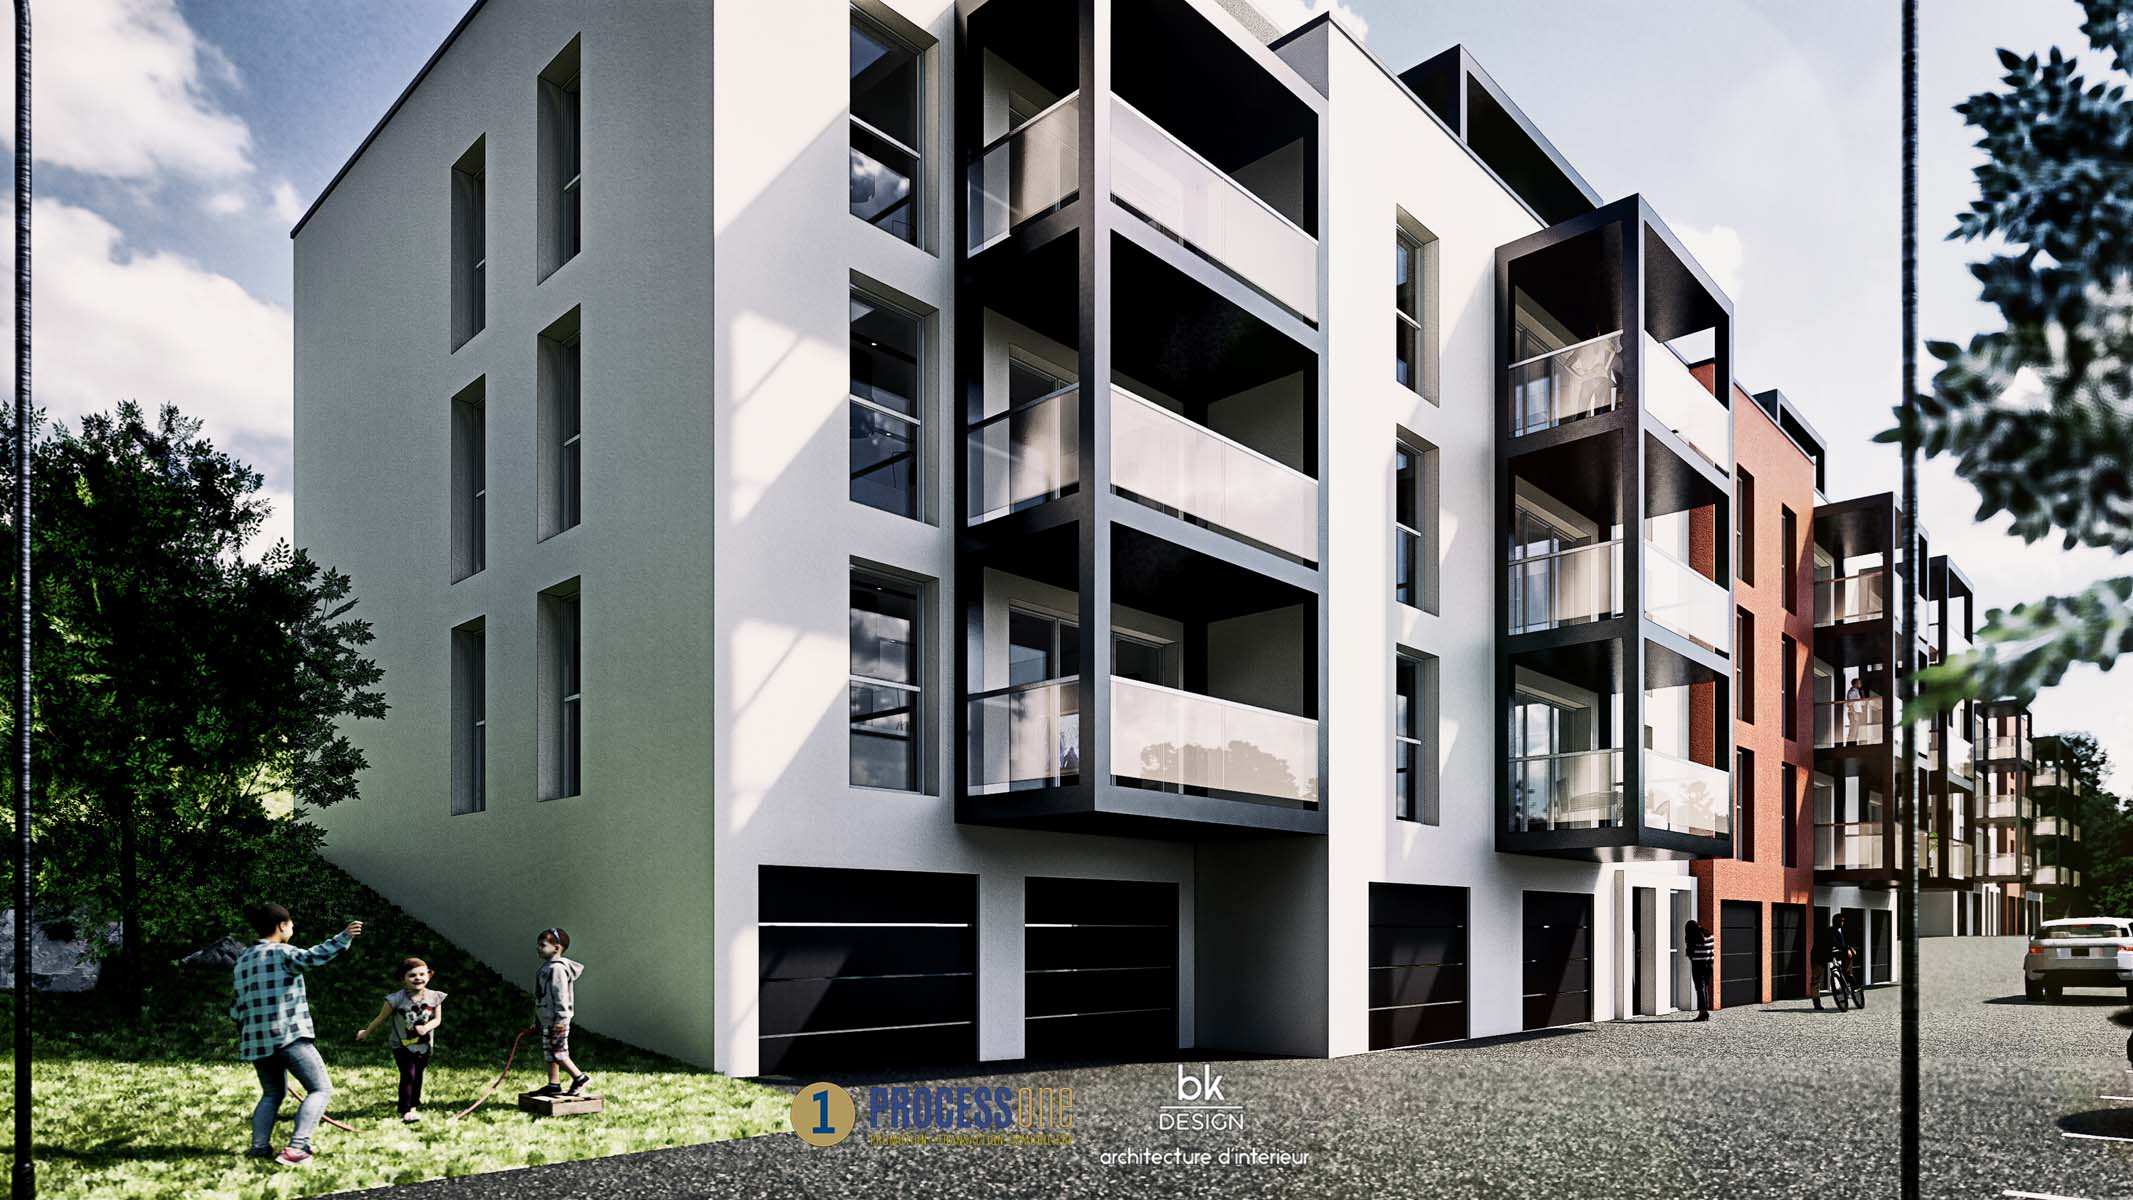 39 bk Design Projet Vesoul v2 R03 Immeuble